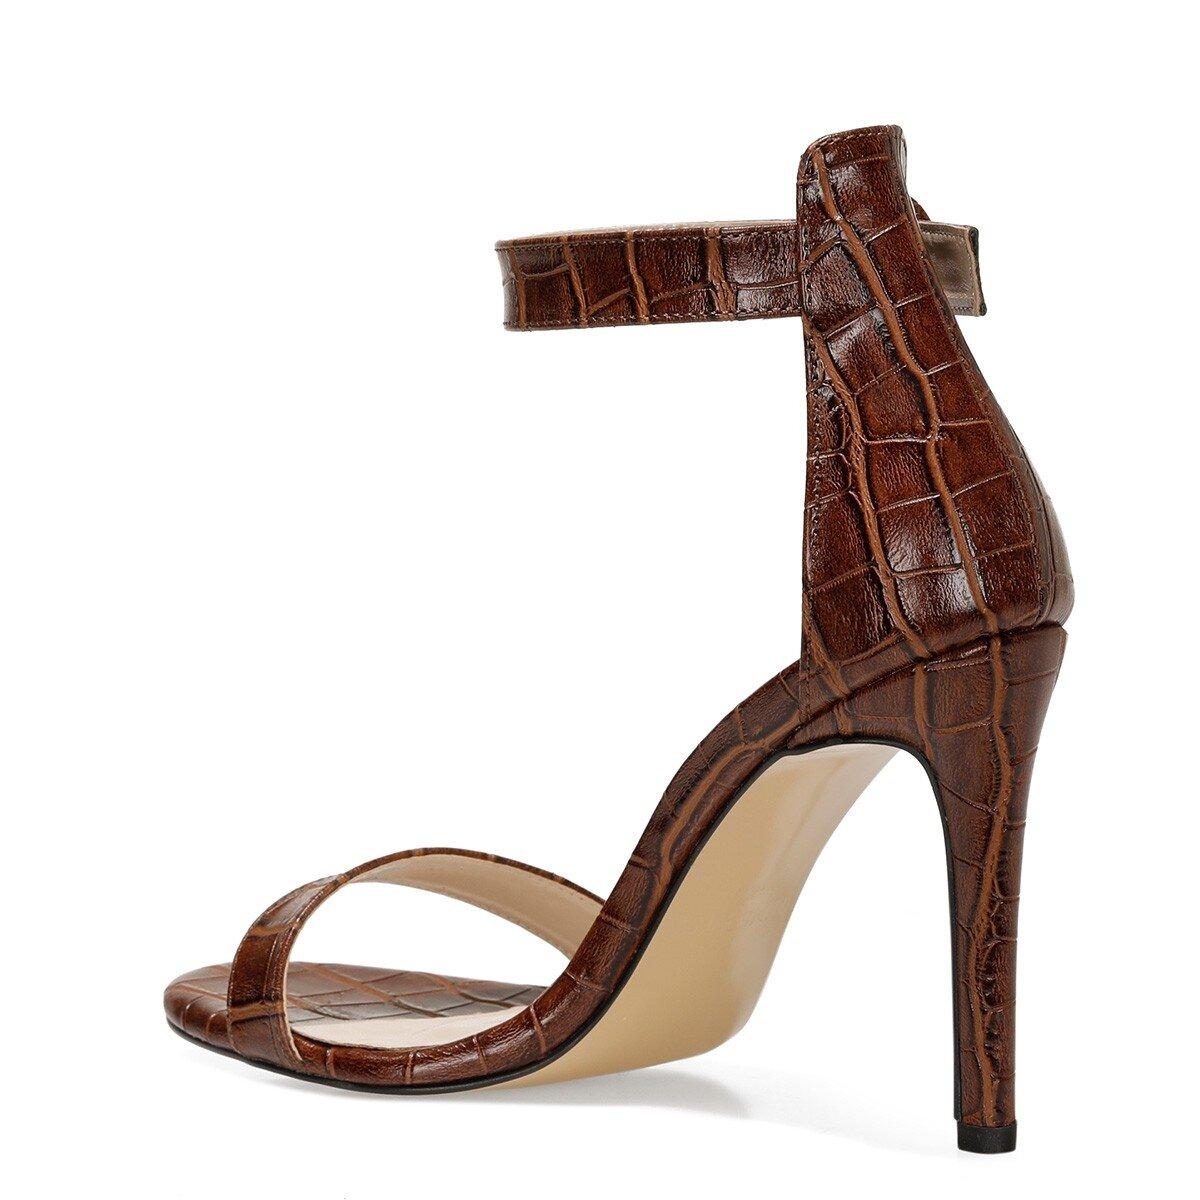 LINDIT 1FX Kahverengi Kadın Sandalet